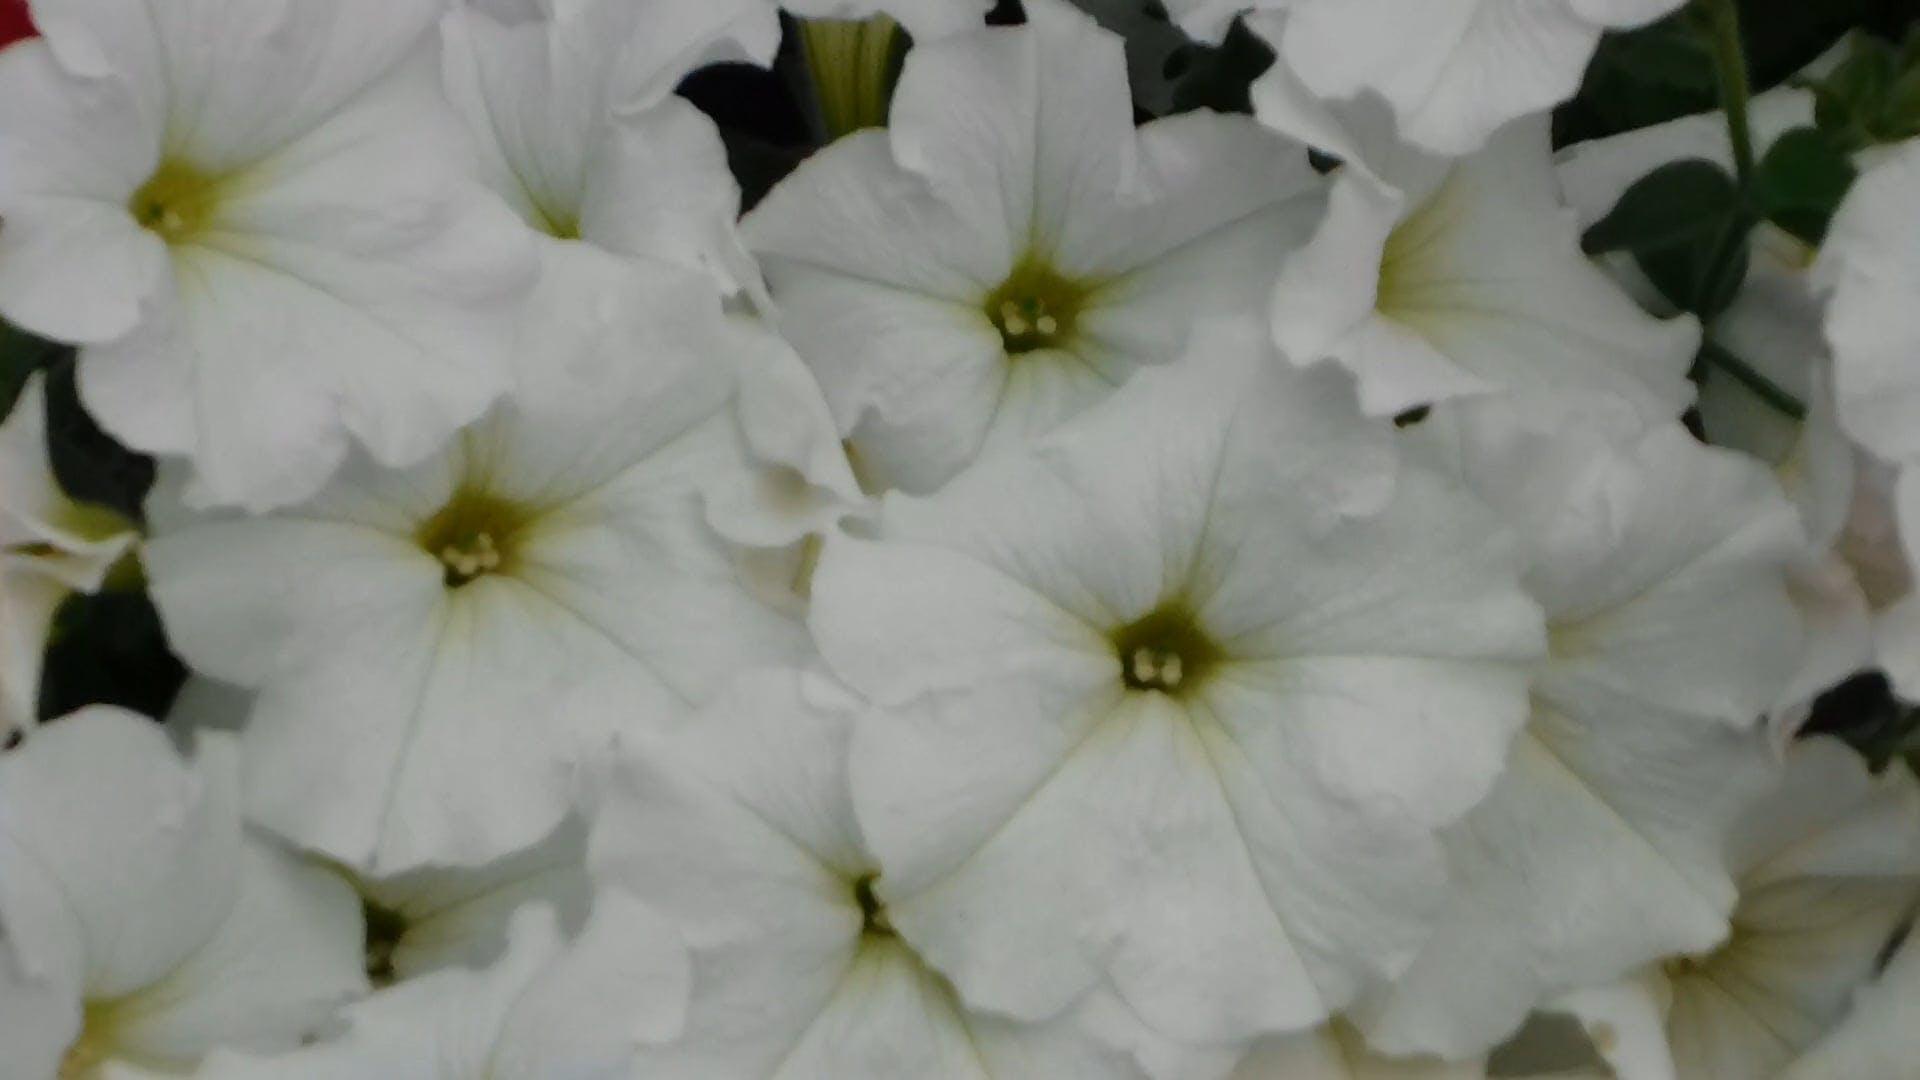 White Petunia Blooms